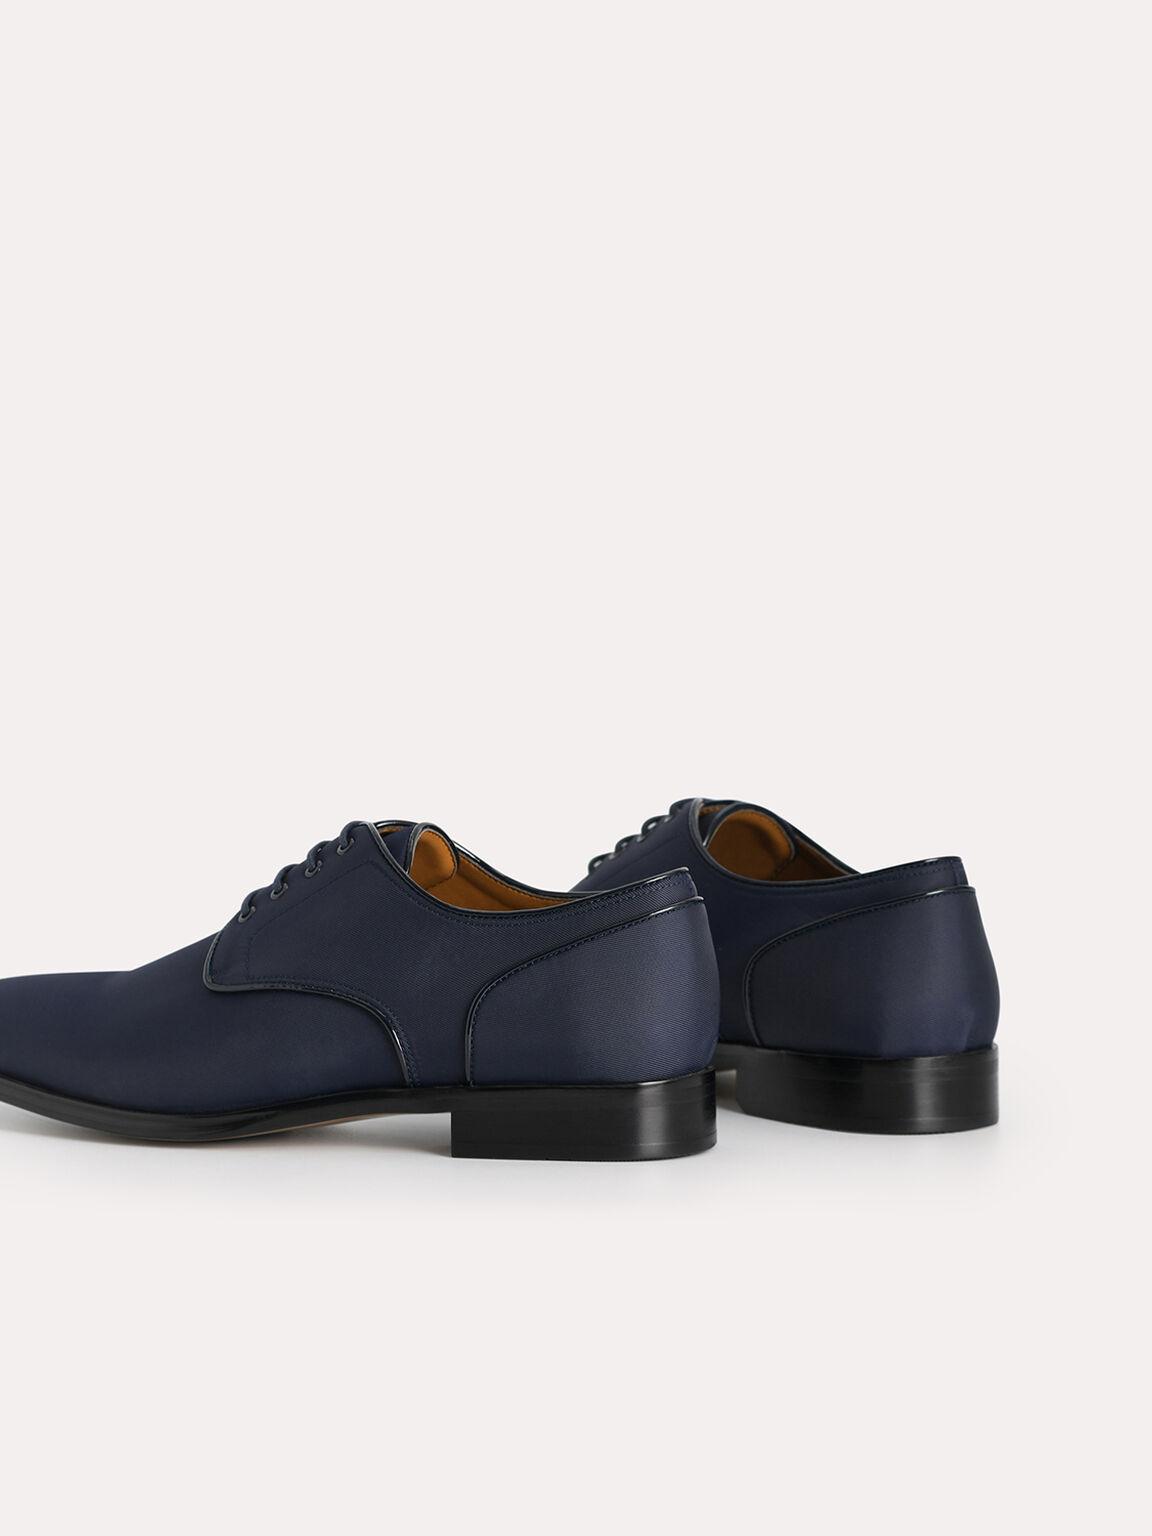 Nylon Derby Shoes, Navy, hi-res